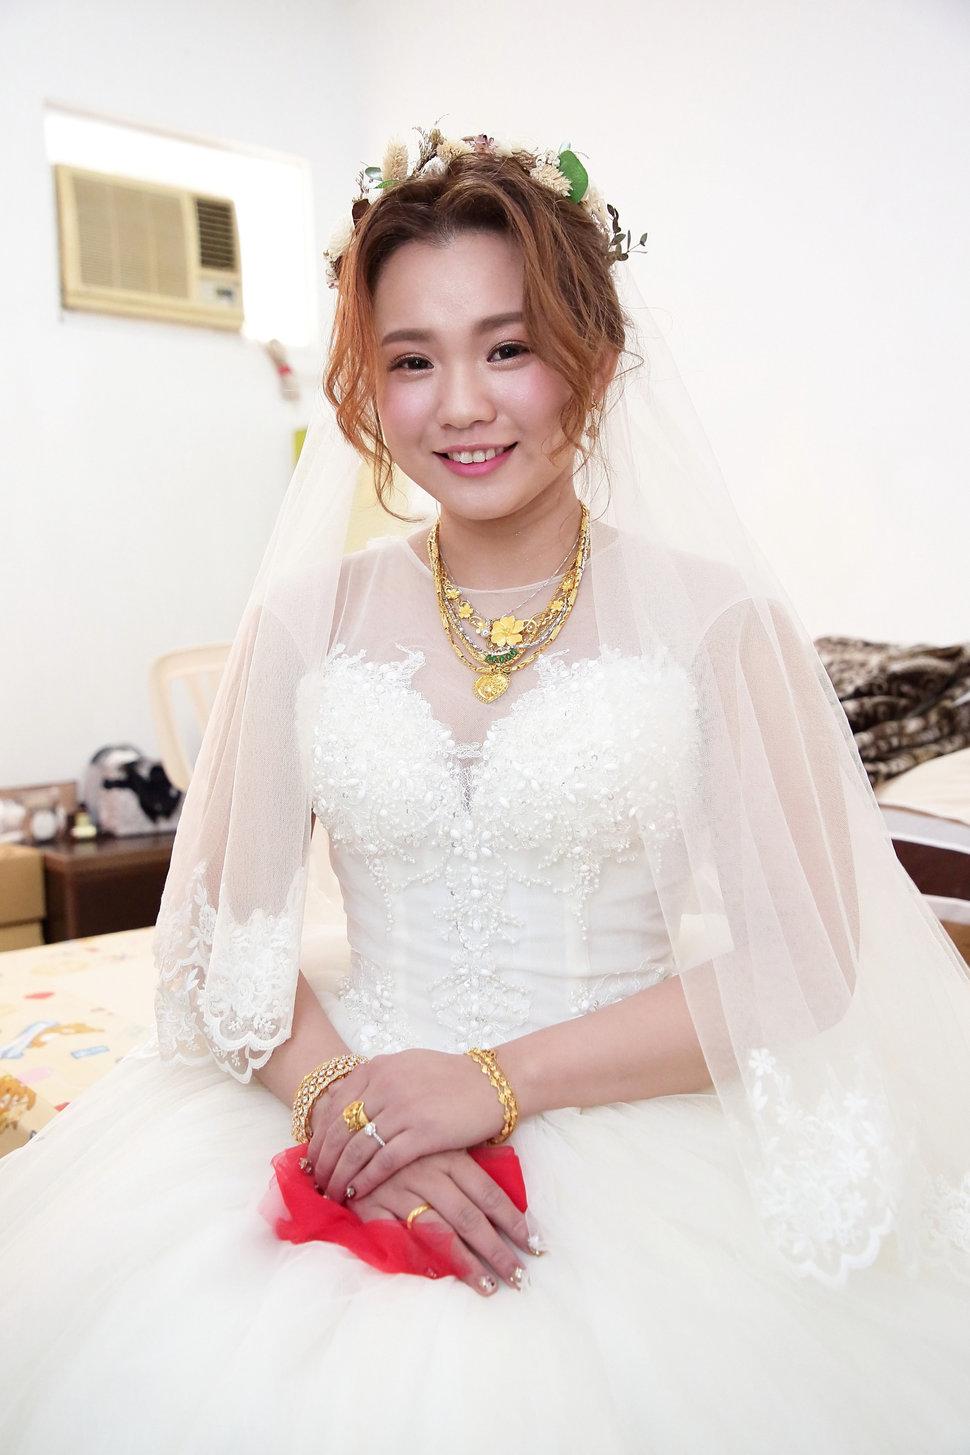 201902230090 - Loveliness ♥ wedding - 結婚吧